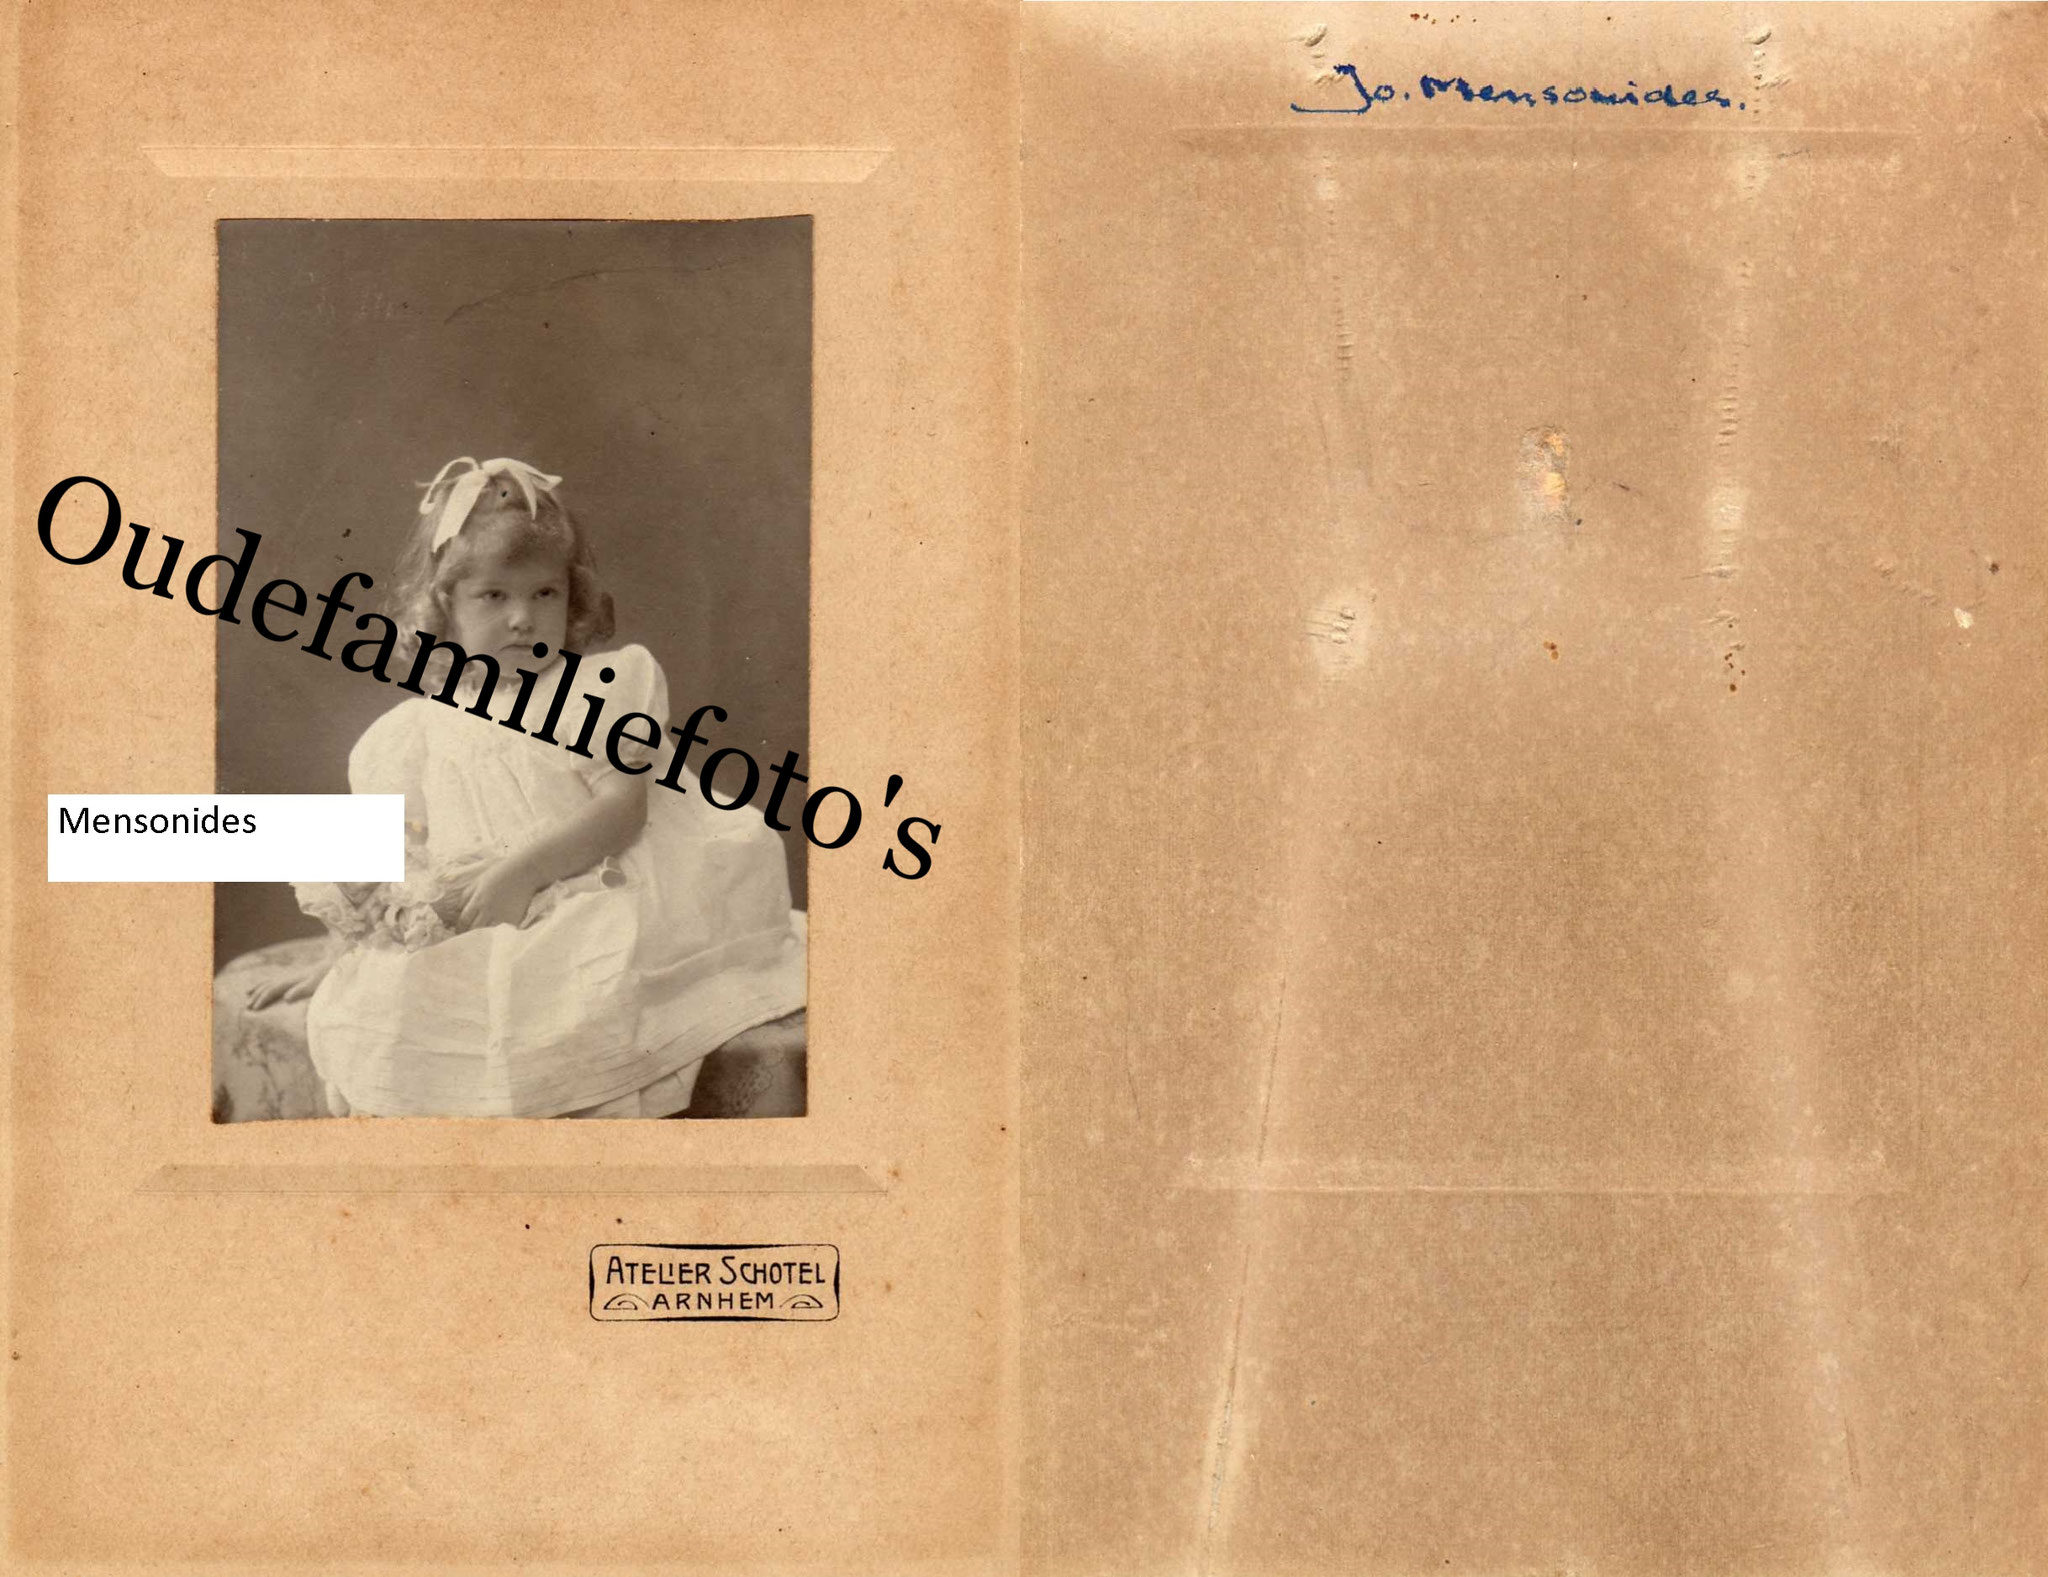 99% Mensonides Johanna Hendrika. Geb. 8-2-1904 Kerkrade. Dochter van Hector Jacob Coenraad en Koldenhof. € 3,00